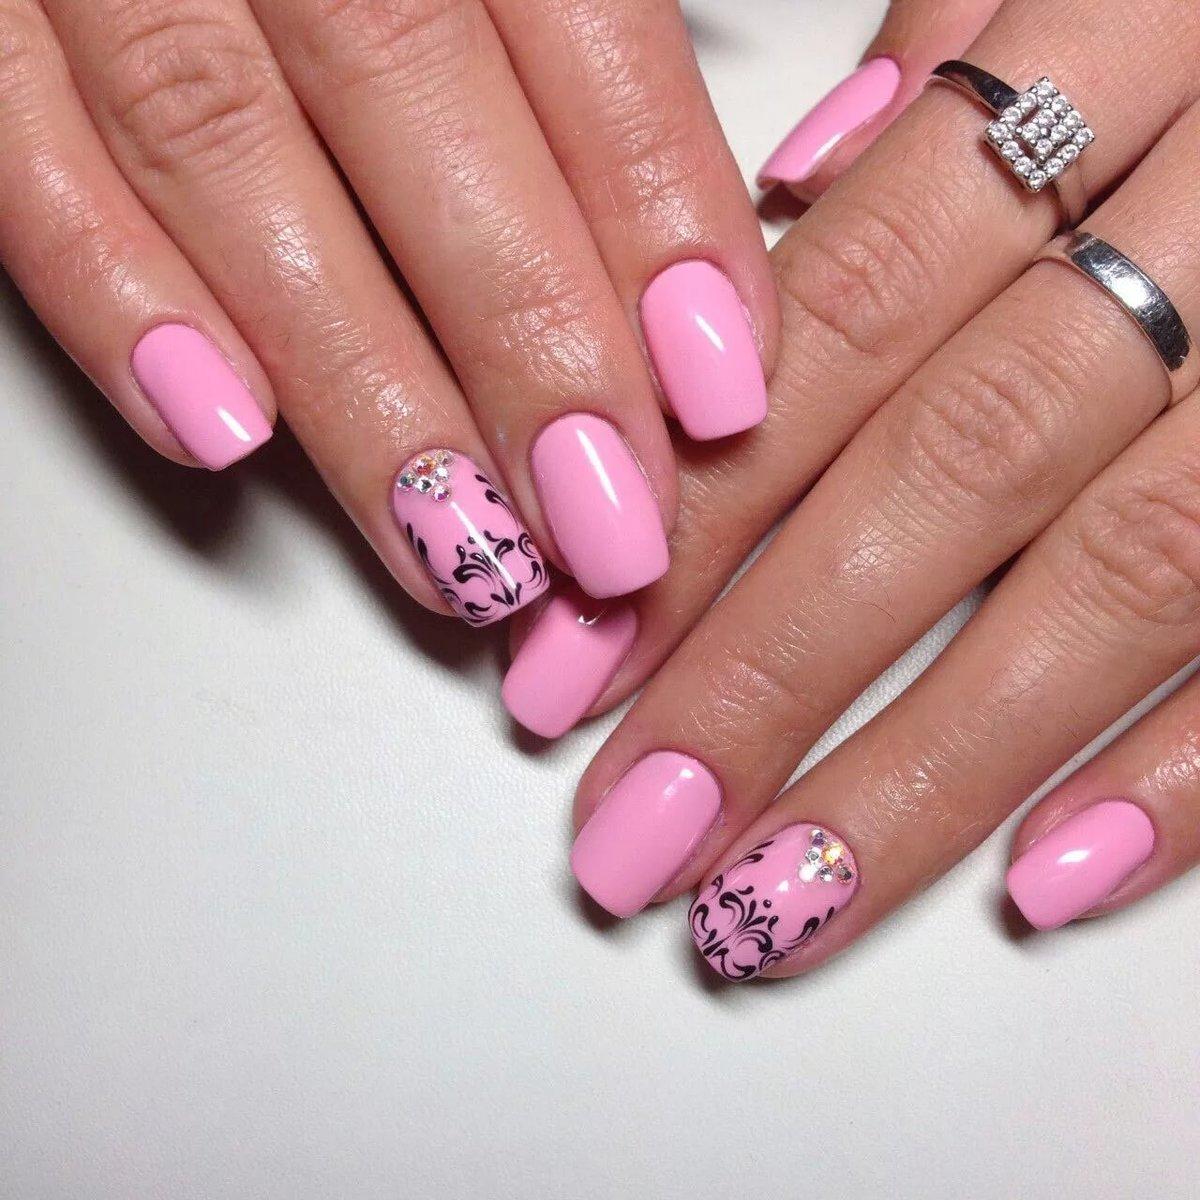 розовый шеллак на ногтях фото сети